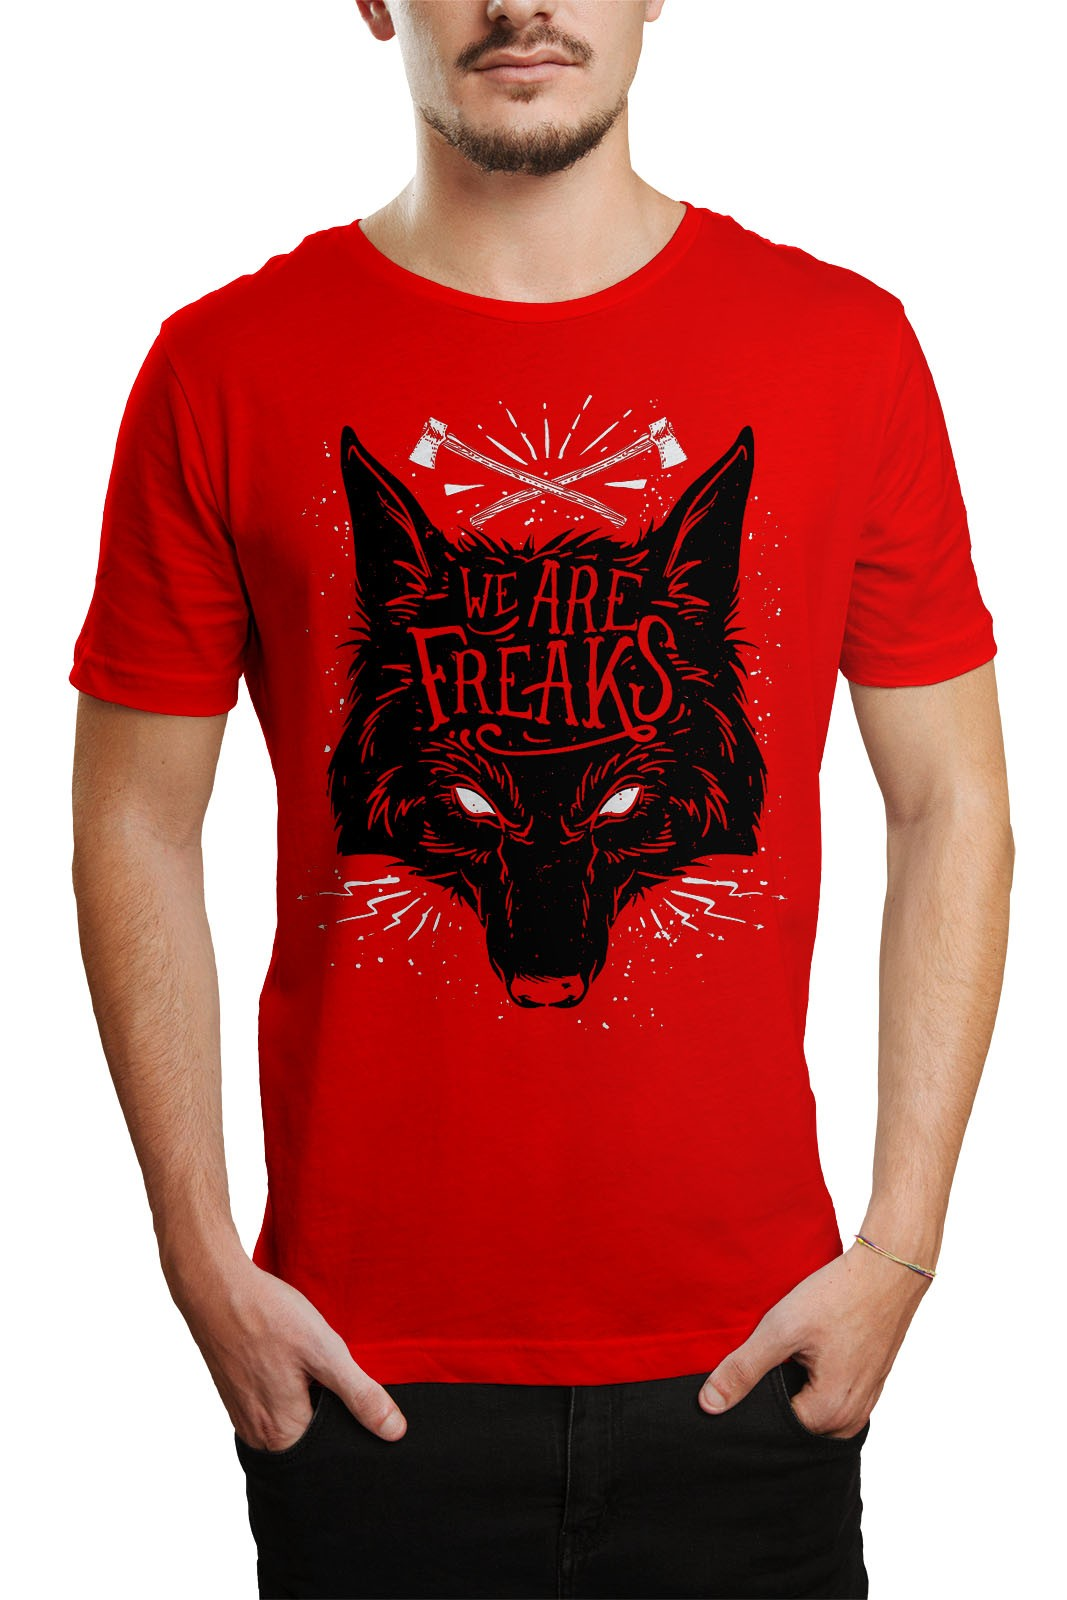 Camiseta HShop We Are Freaks Vermelho  - HShop